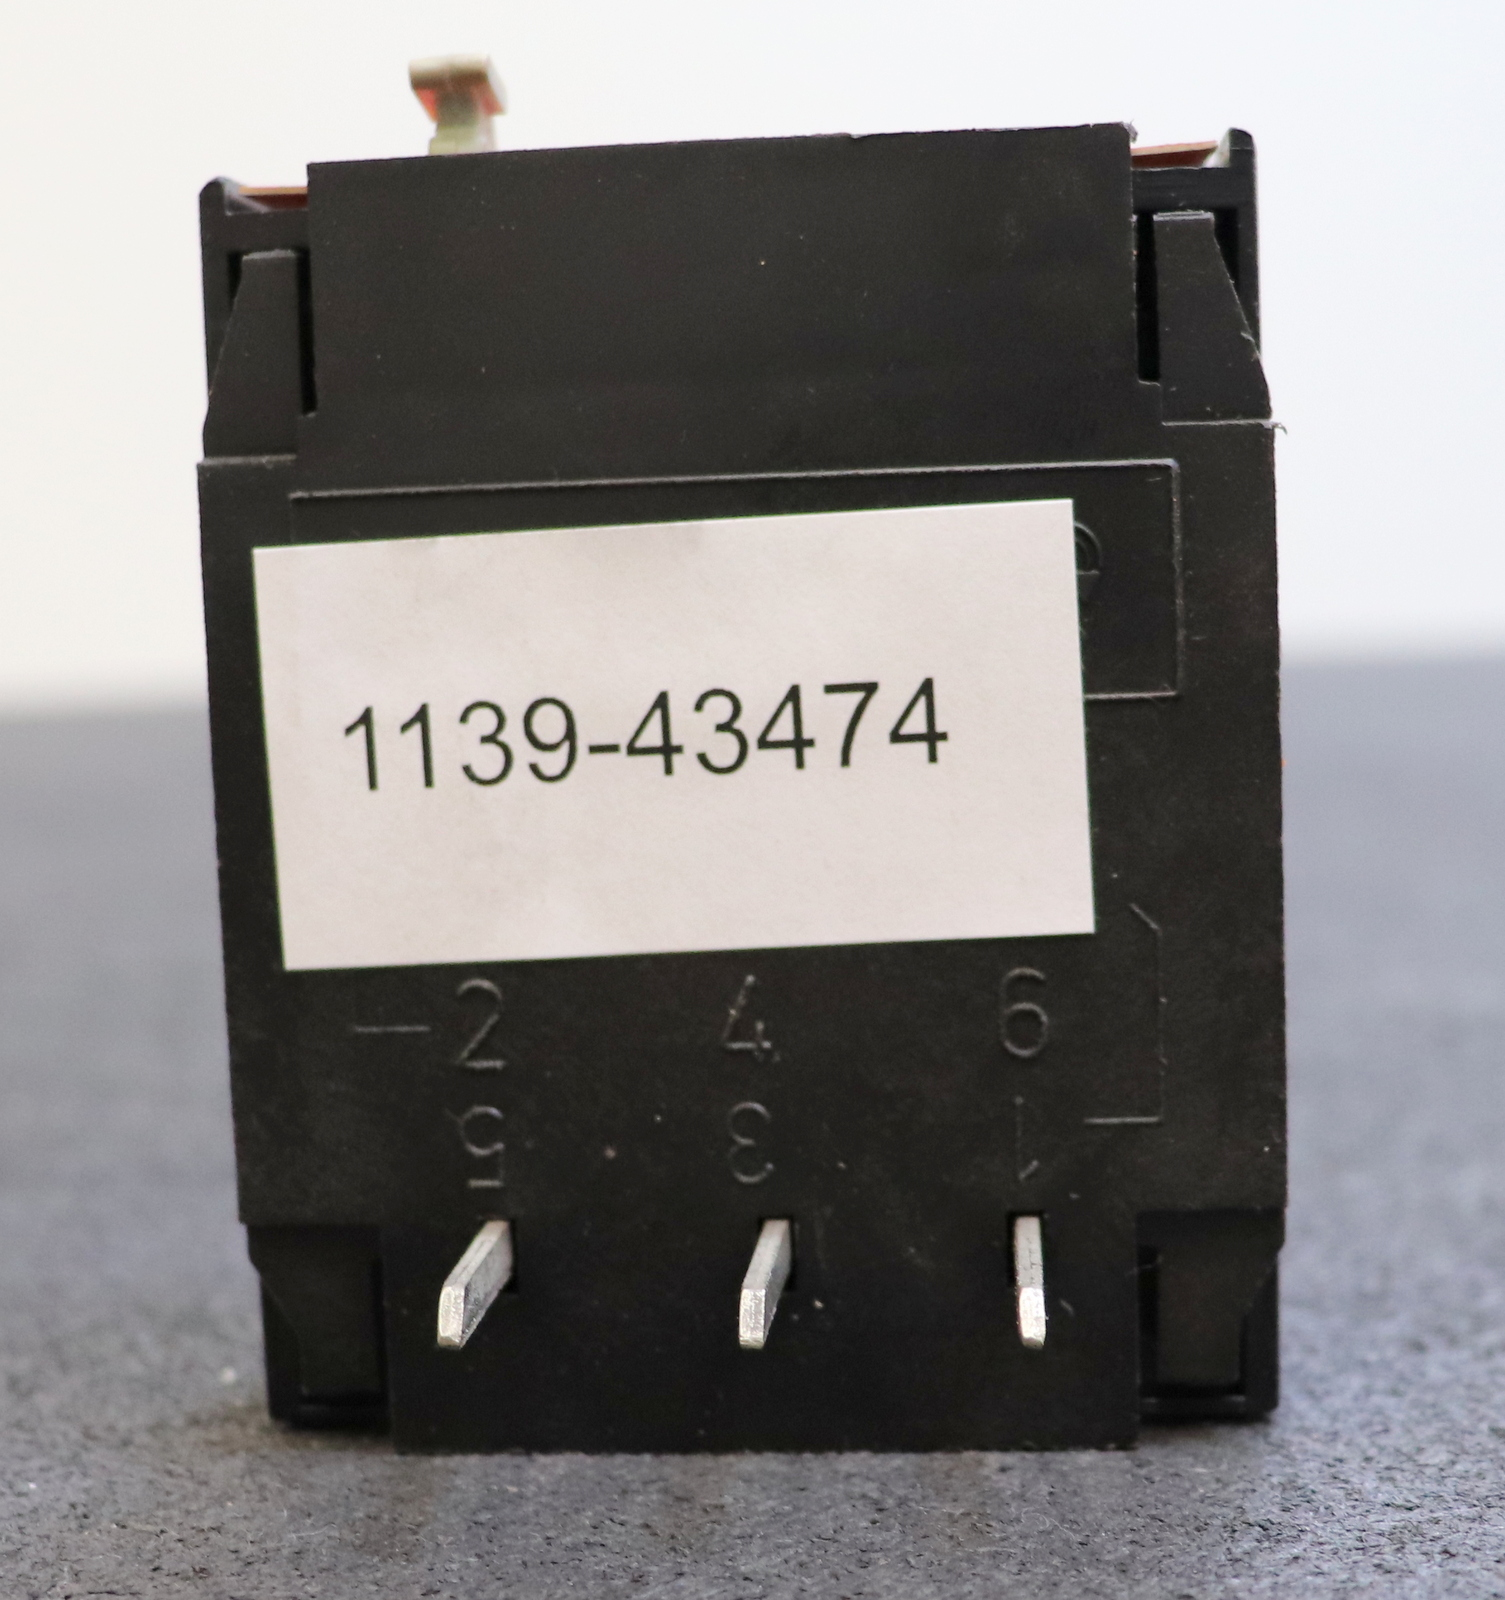 Verbindungsöse Klemmenleiste 660V 30A doppelte Reihen 10P DIN Schiene Anschluss